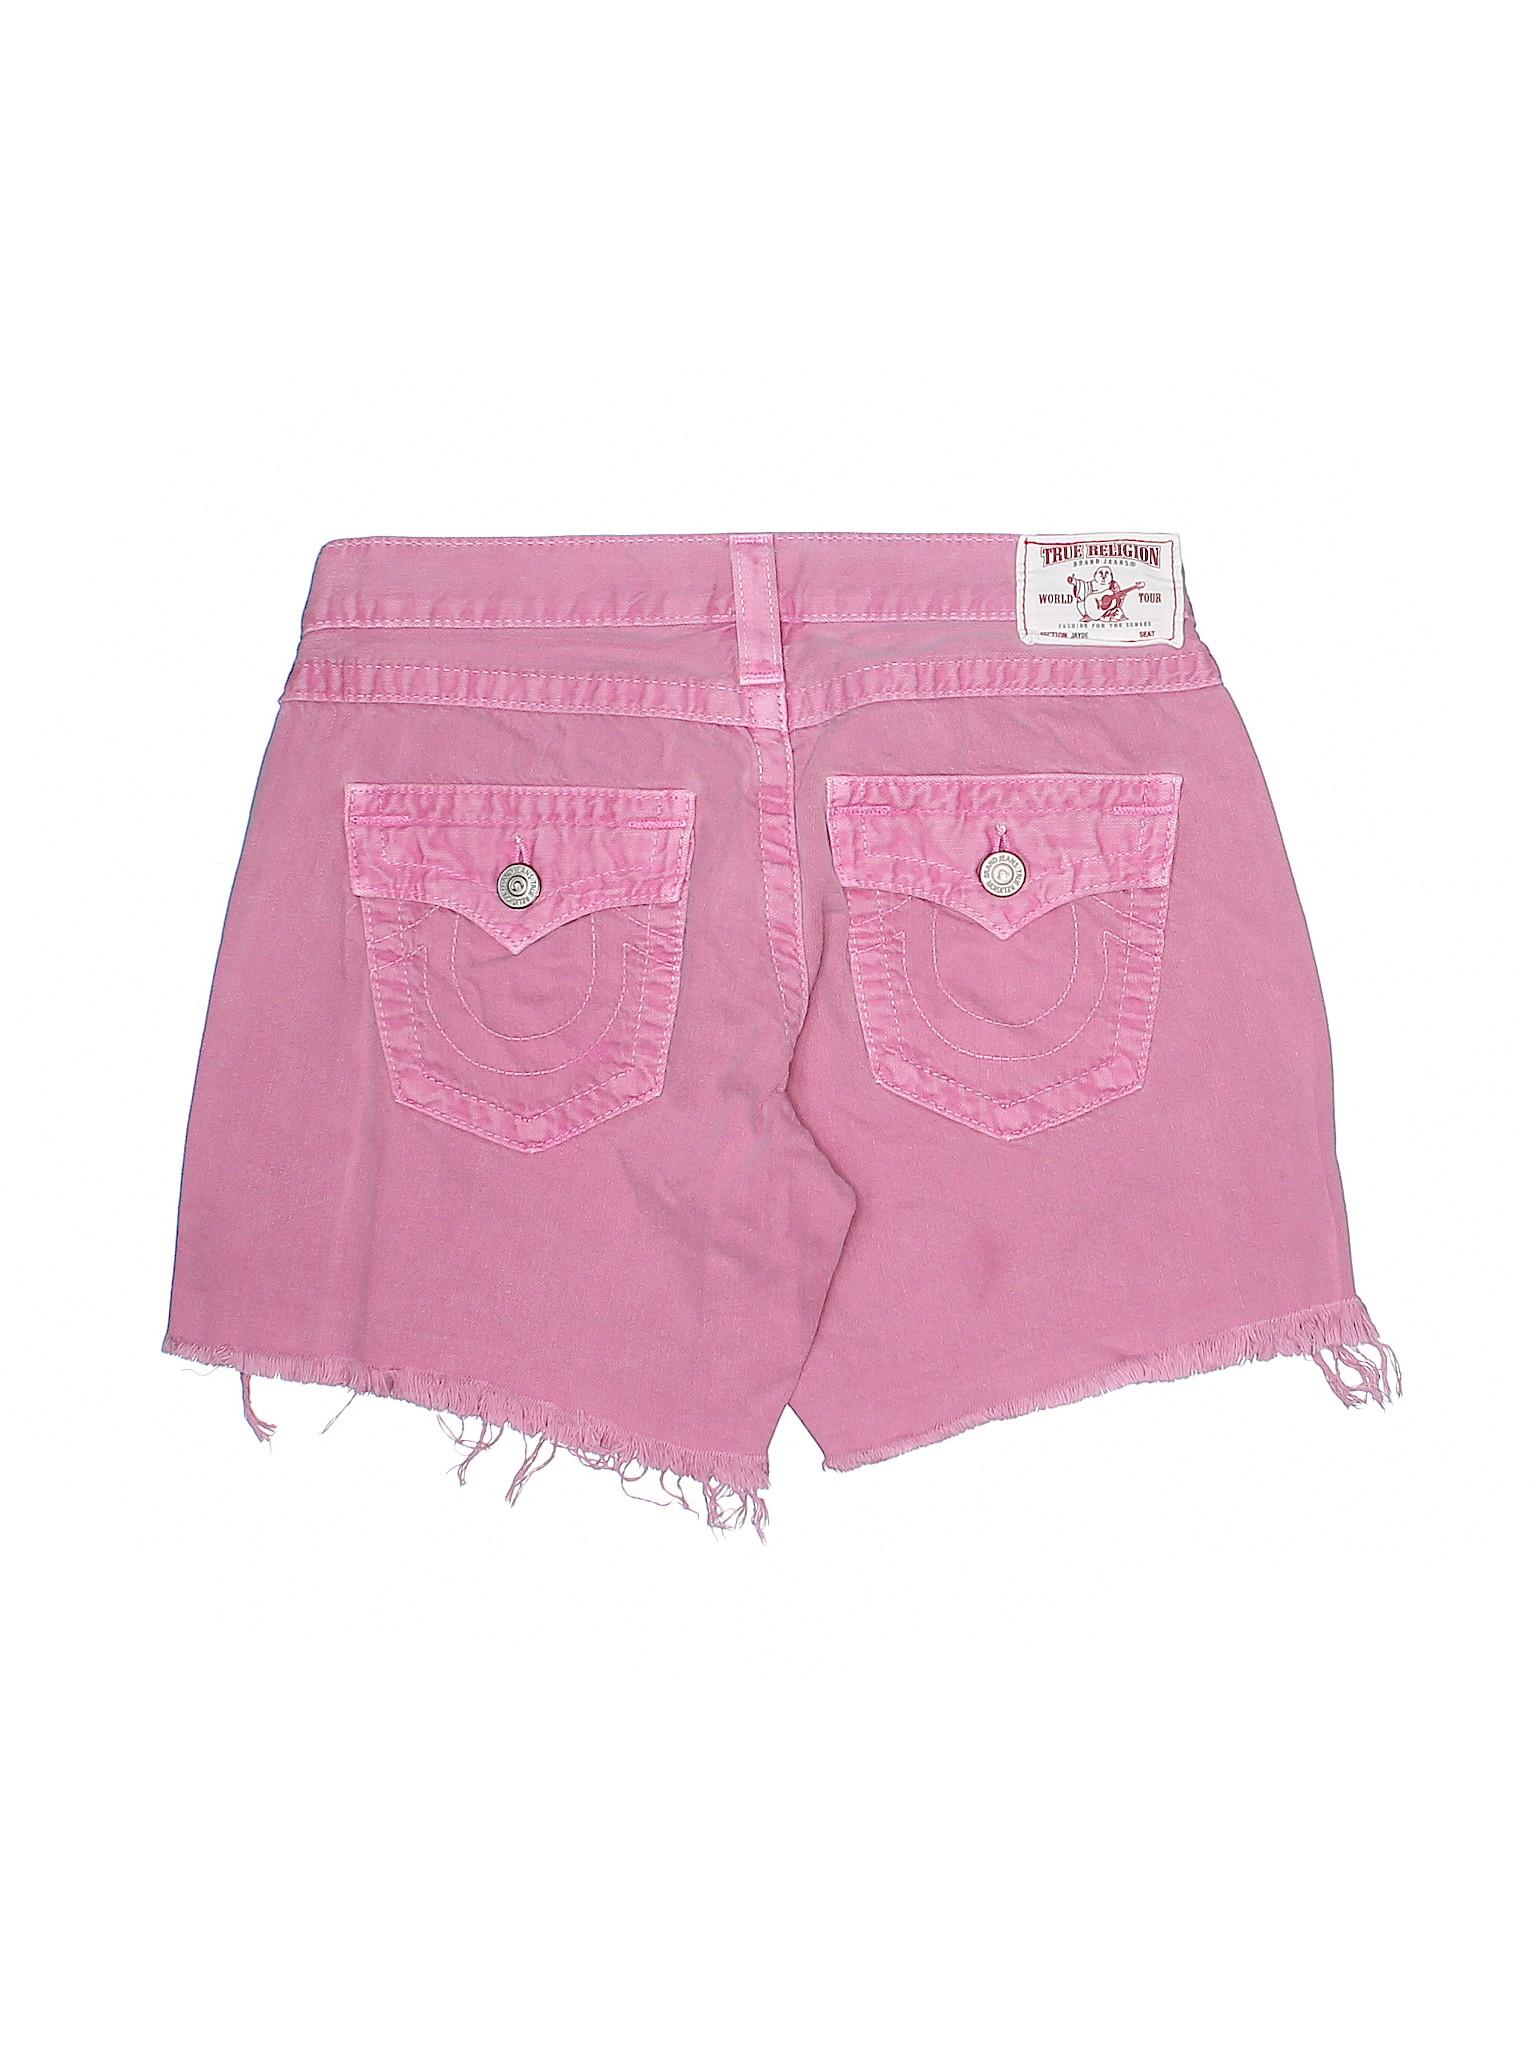 leisure Denim Religion True Shorts Boutique RPw4zqP